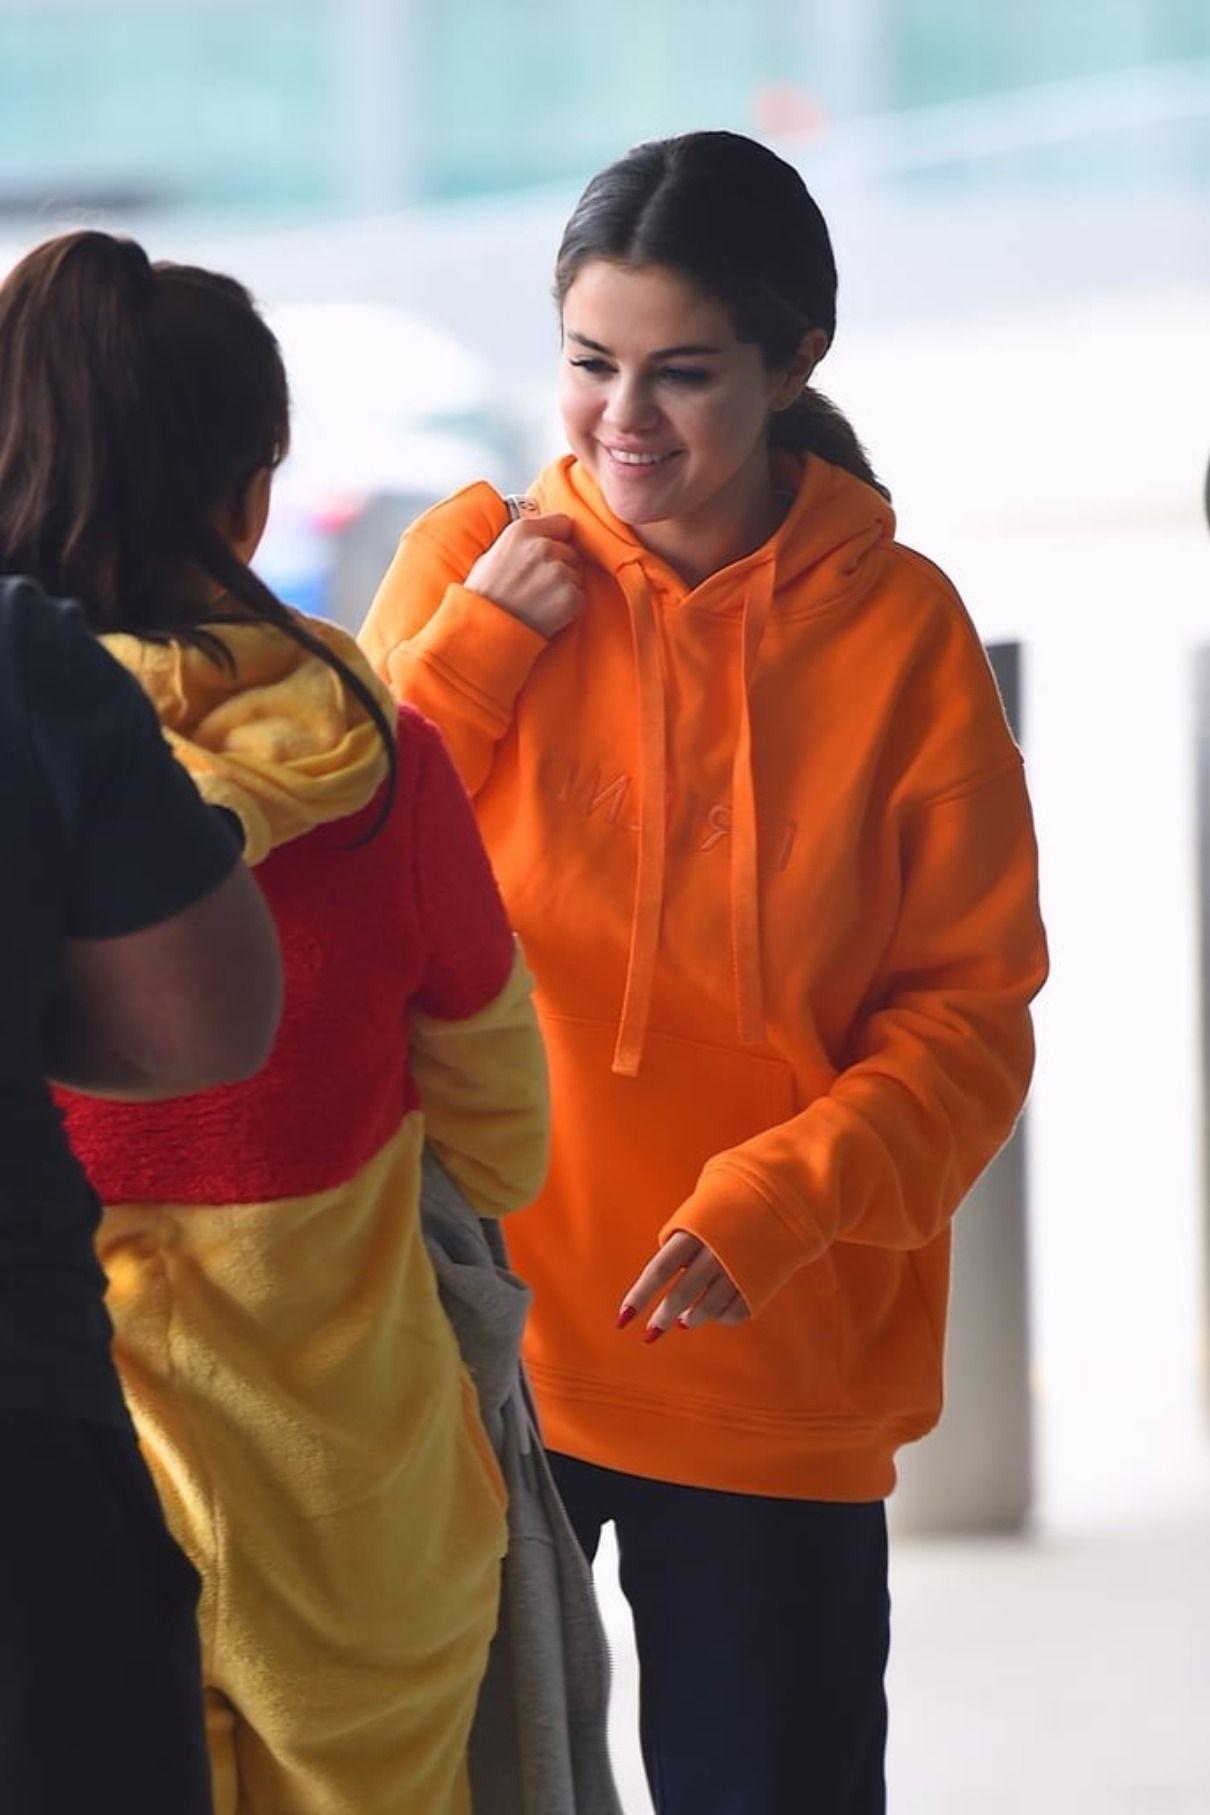 Predownload: Selena Gomez In Friend Hoodie And Syf Track Pant Selena Gomez Style Sweatsuit Selena Gomez Airport [ 1815 x 1210 Pixel ]